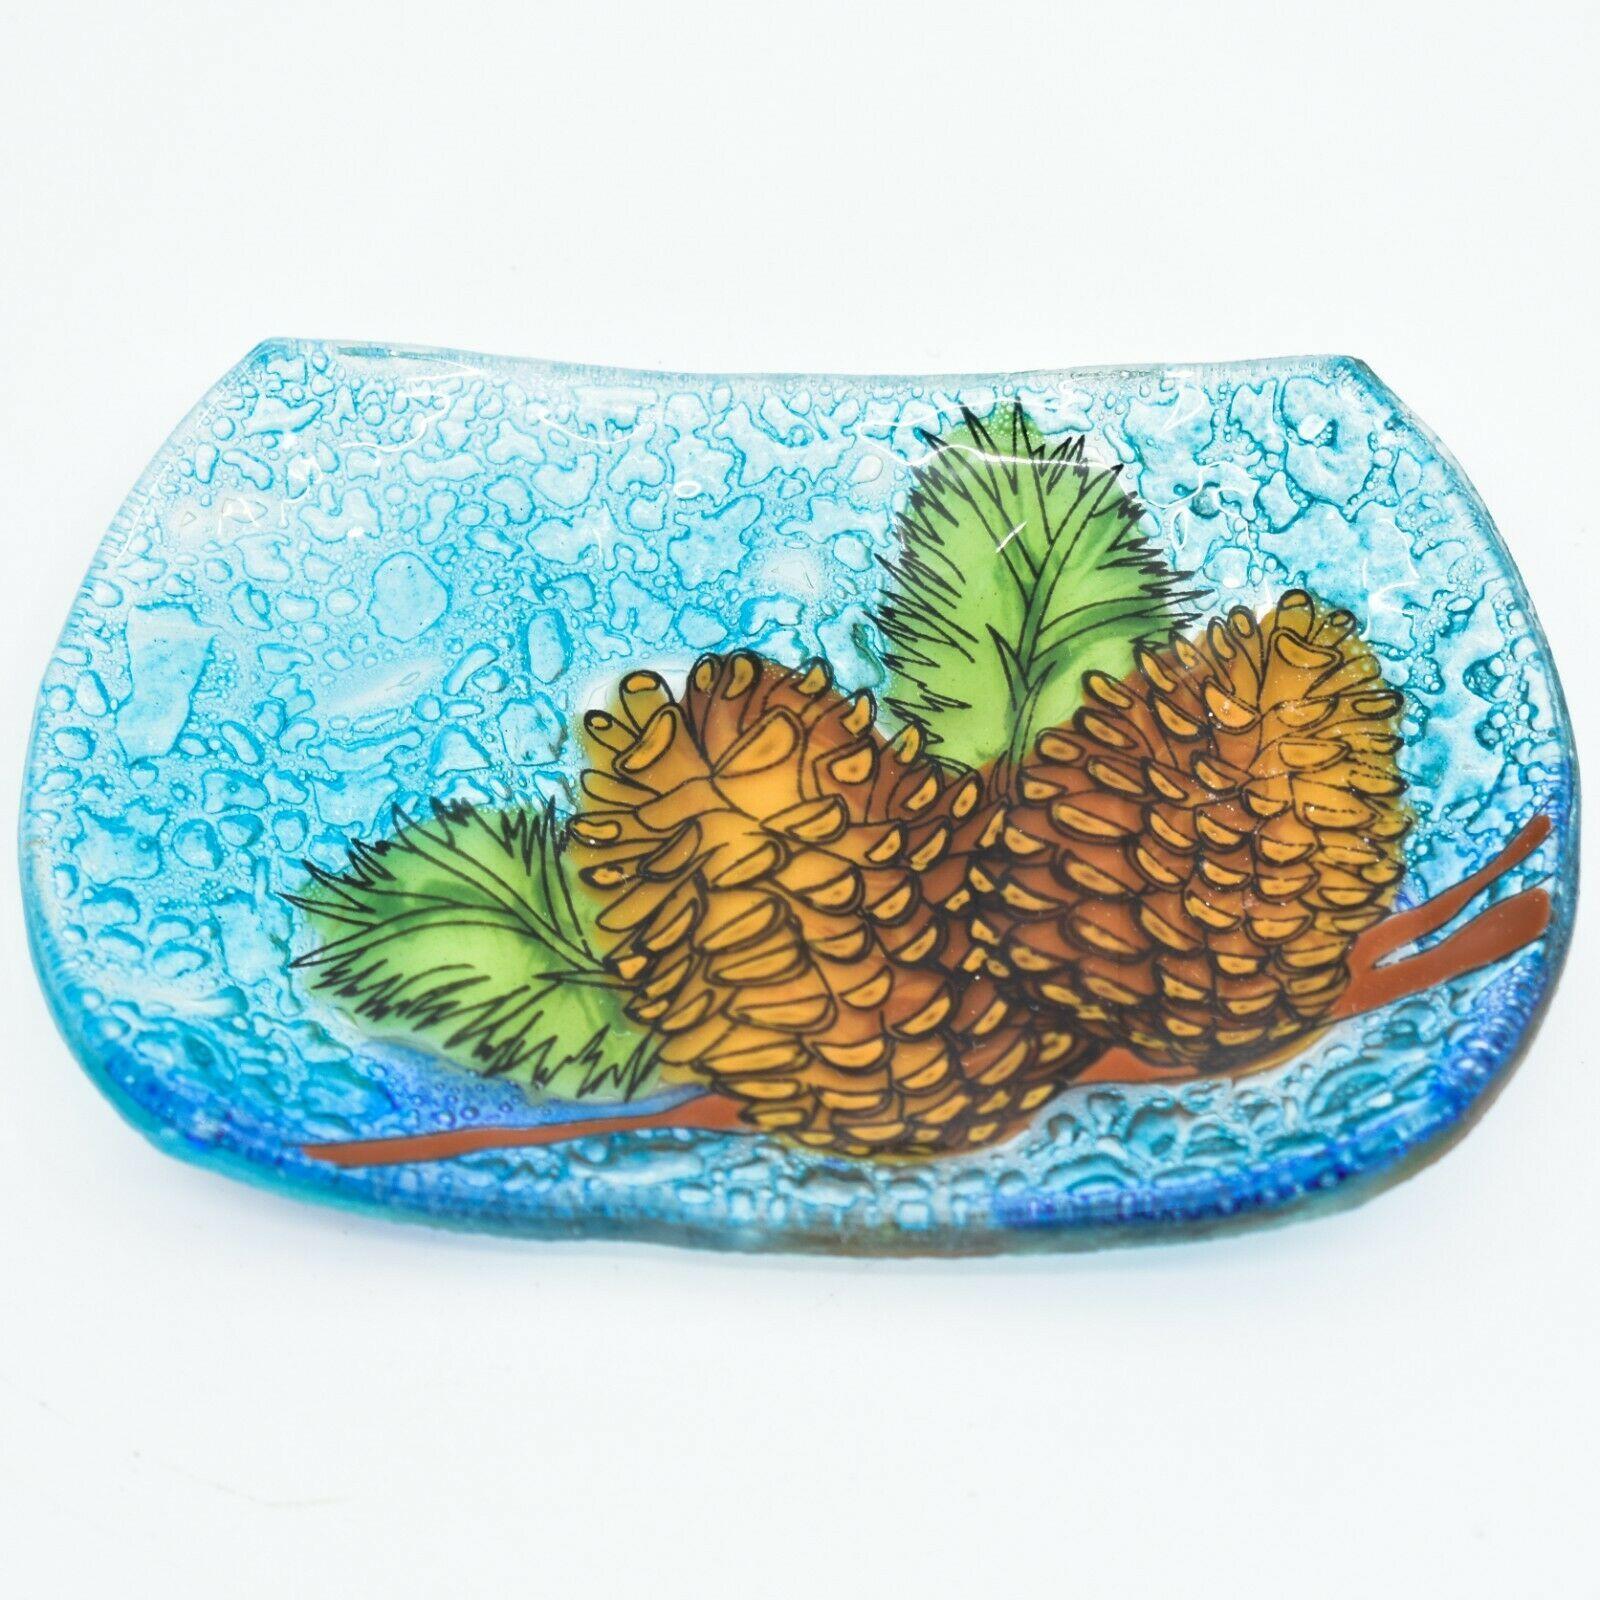 Fused Art Glass Rustic Forest Pinecone Design Soap Dish Handmade in Ecuador